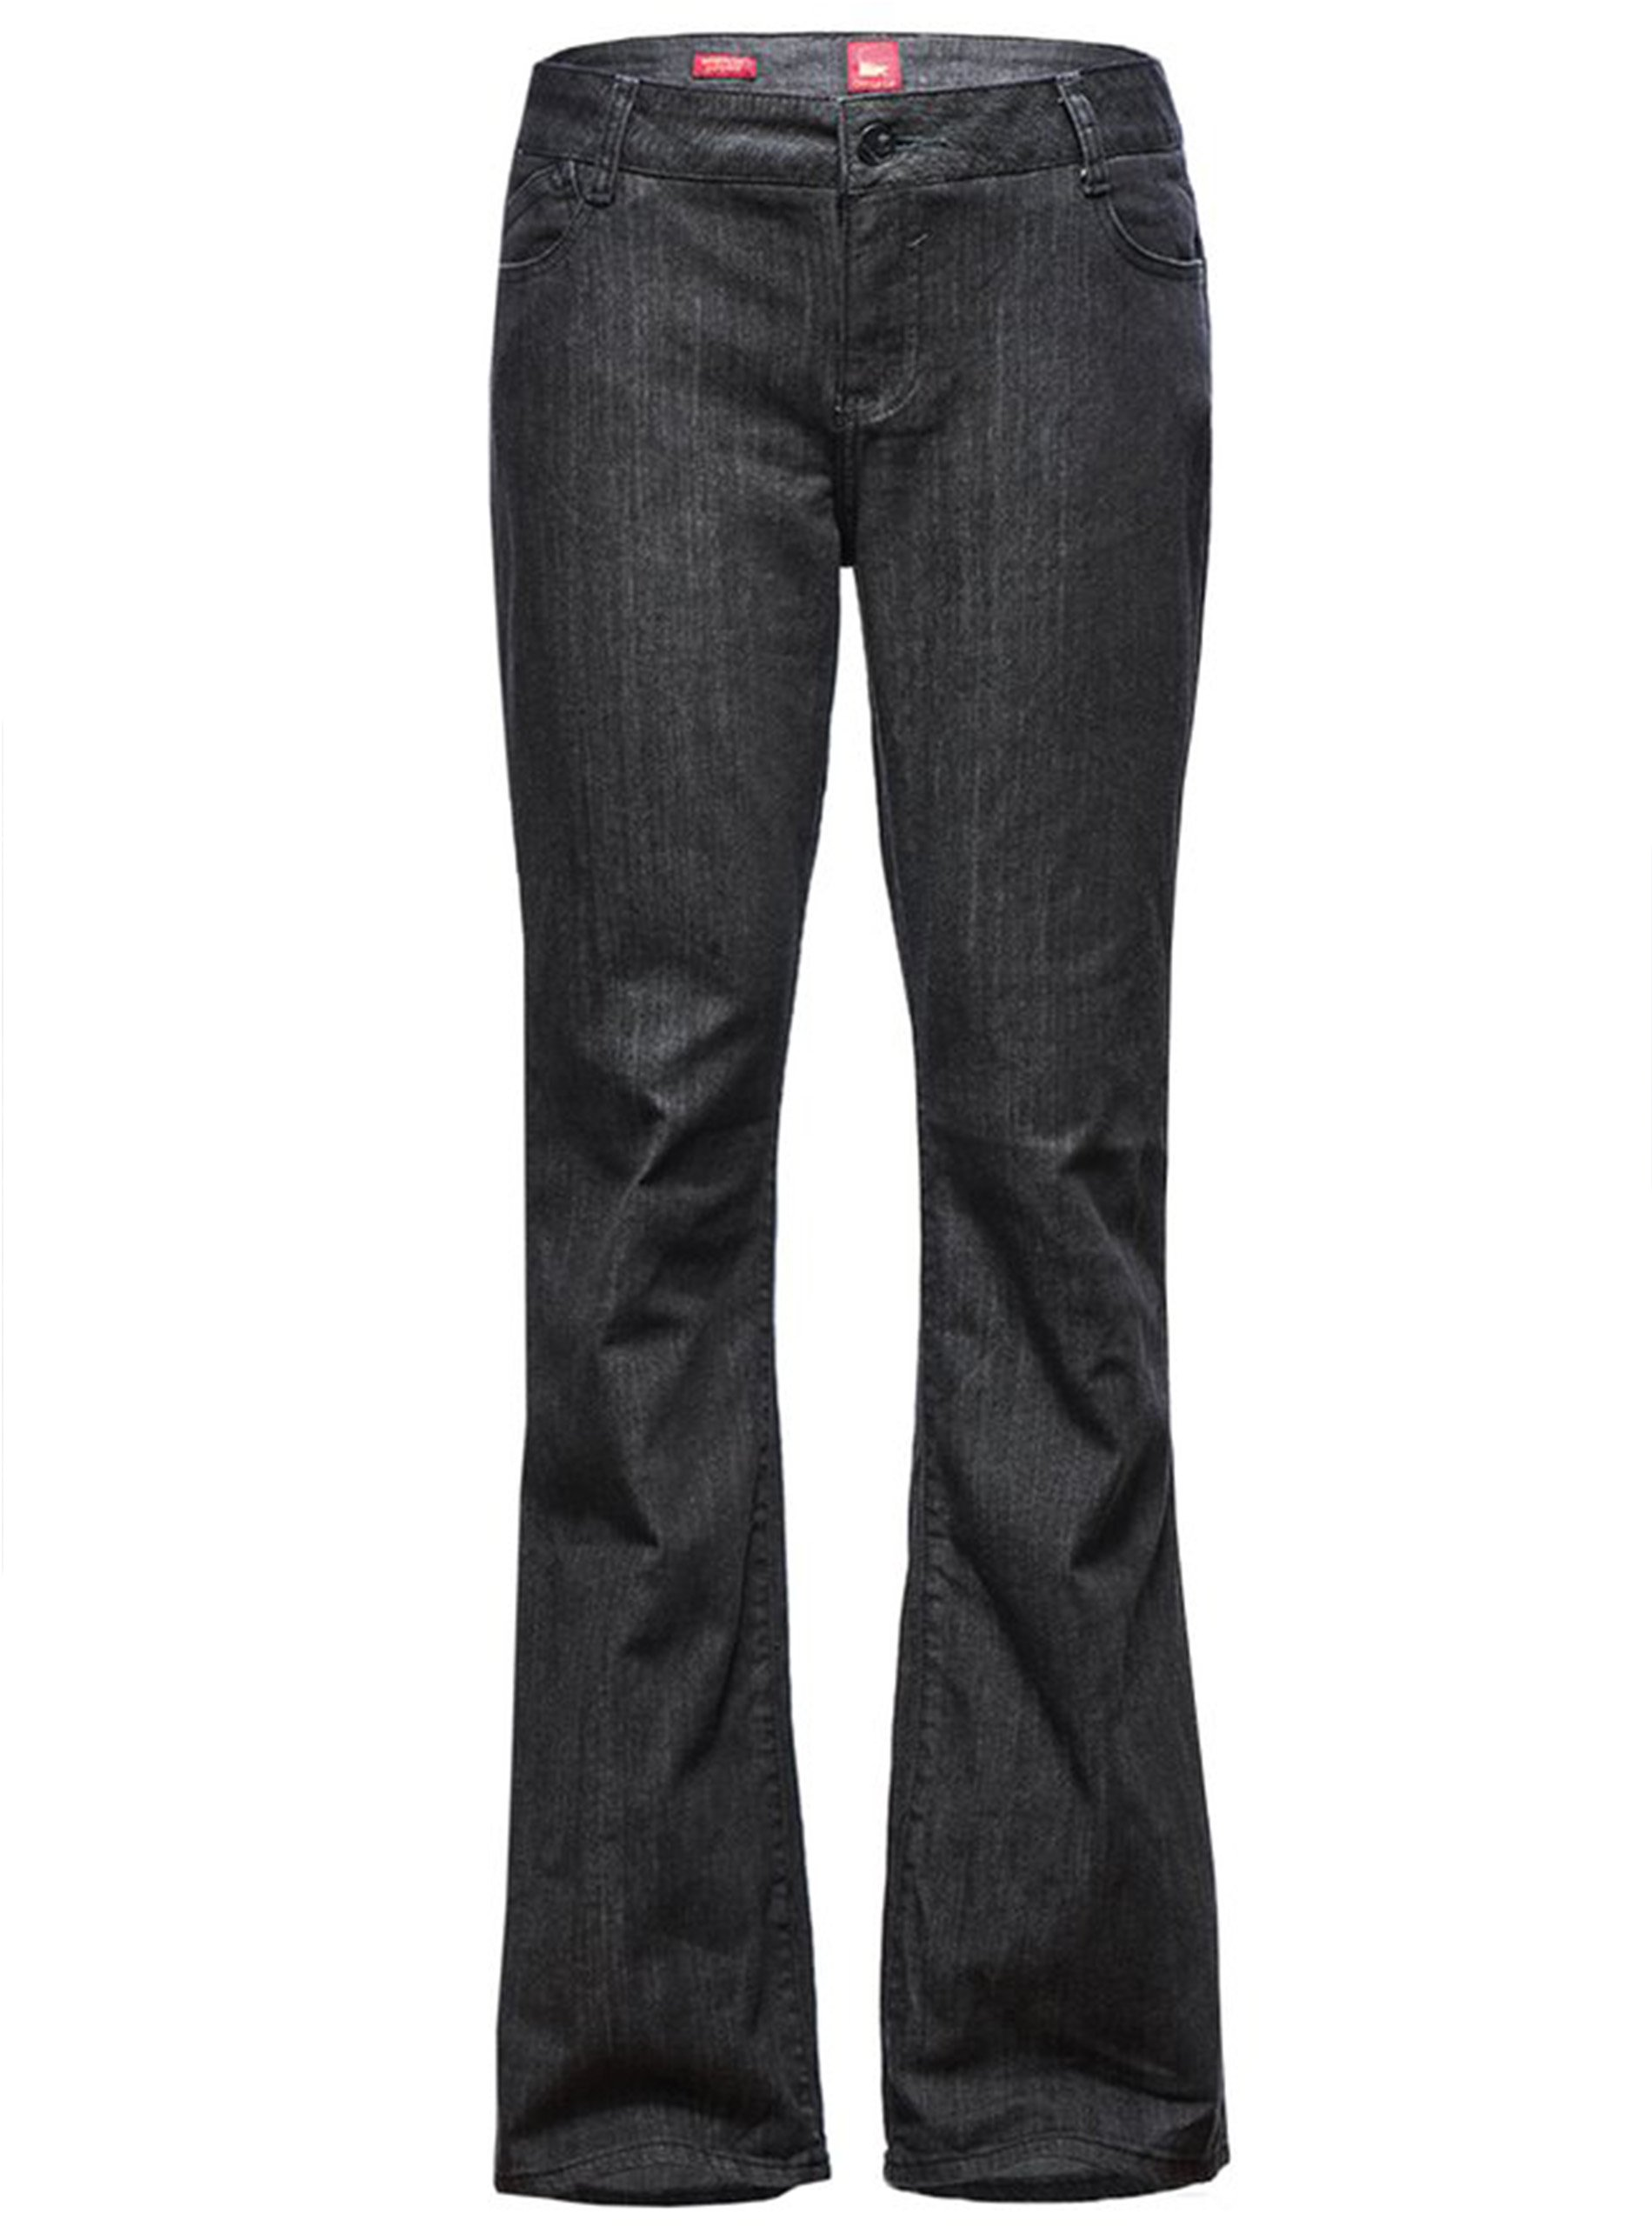 ZITY Women's Sadie Straight 5 Pocket Mid Rise Super Denim Jeans Black 4